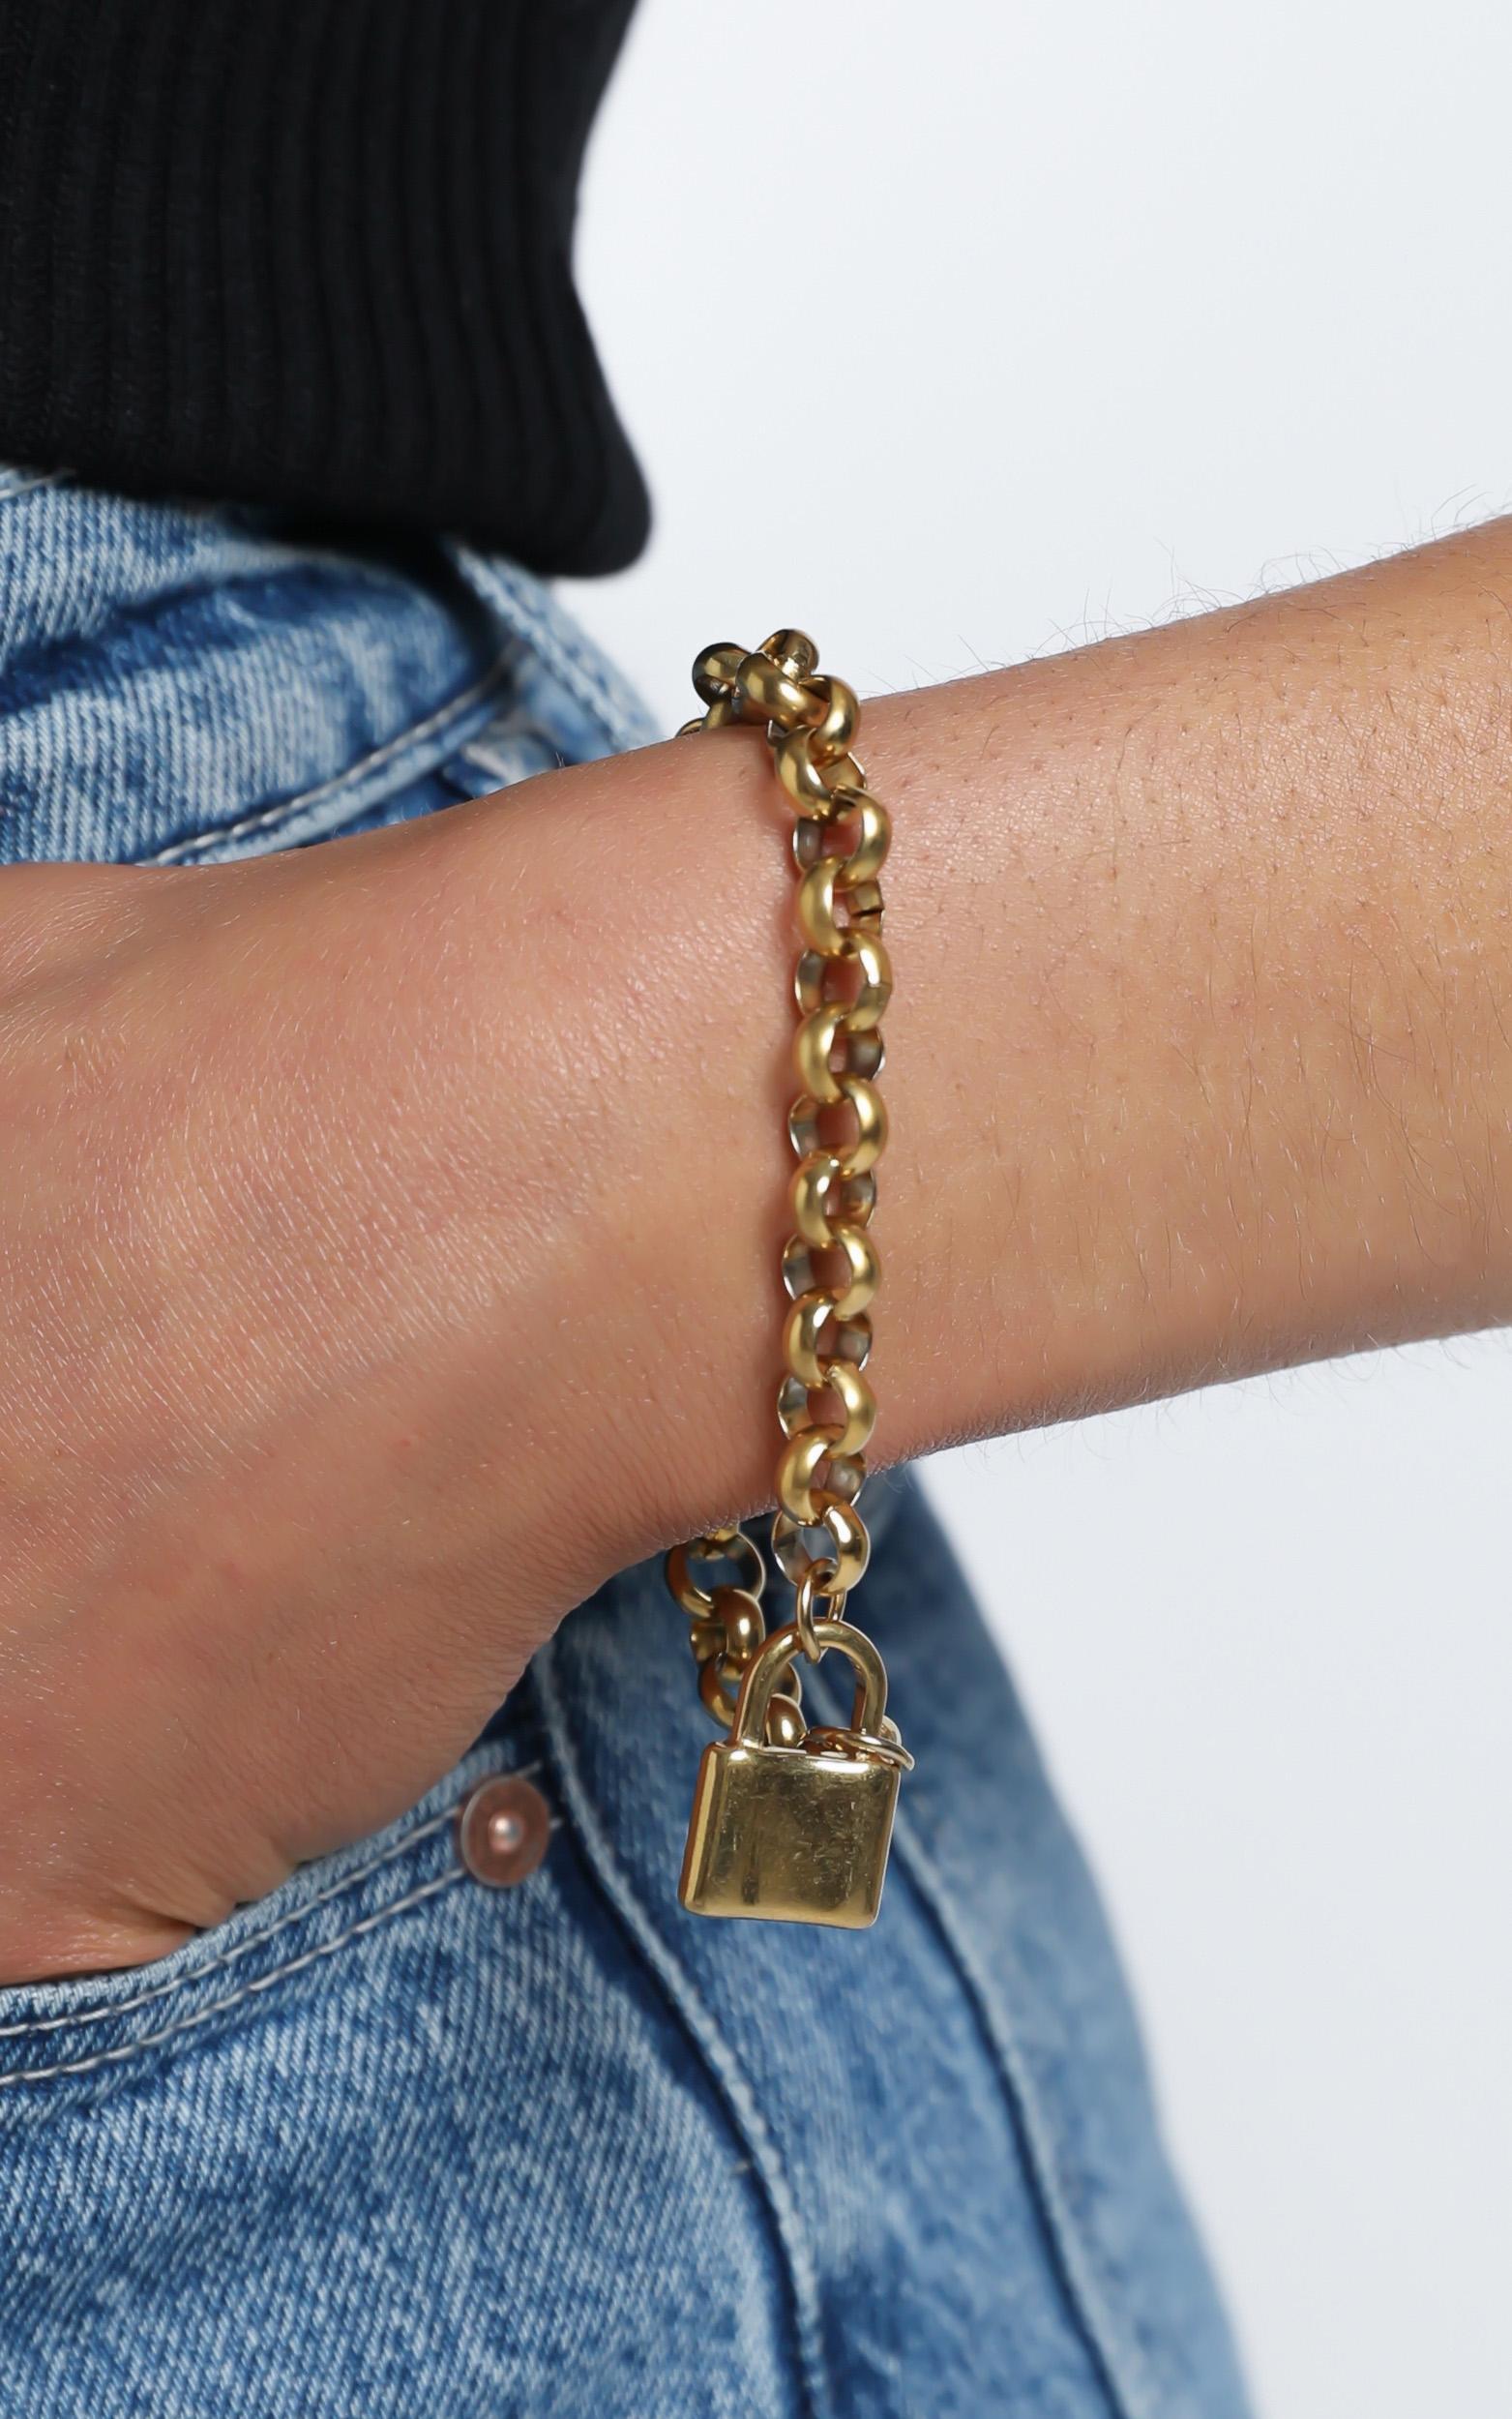 Auley Bracelet in Gold, , hi-res image number null